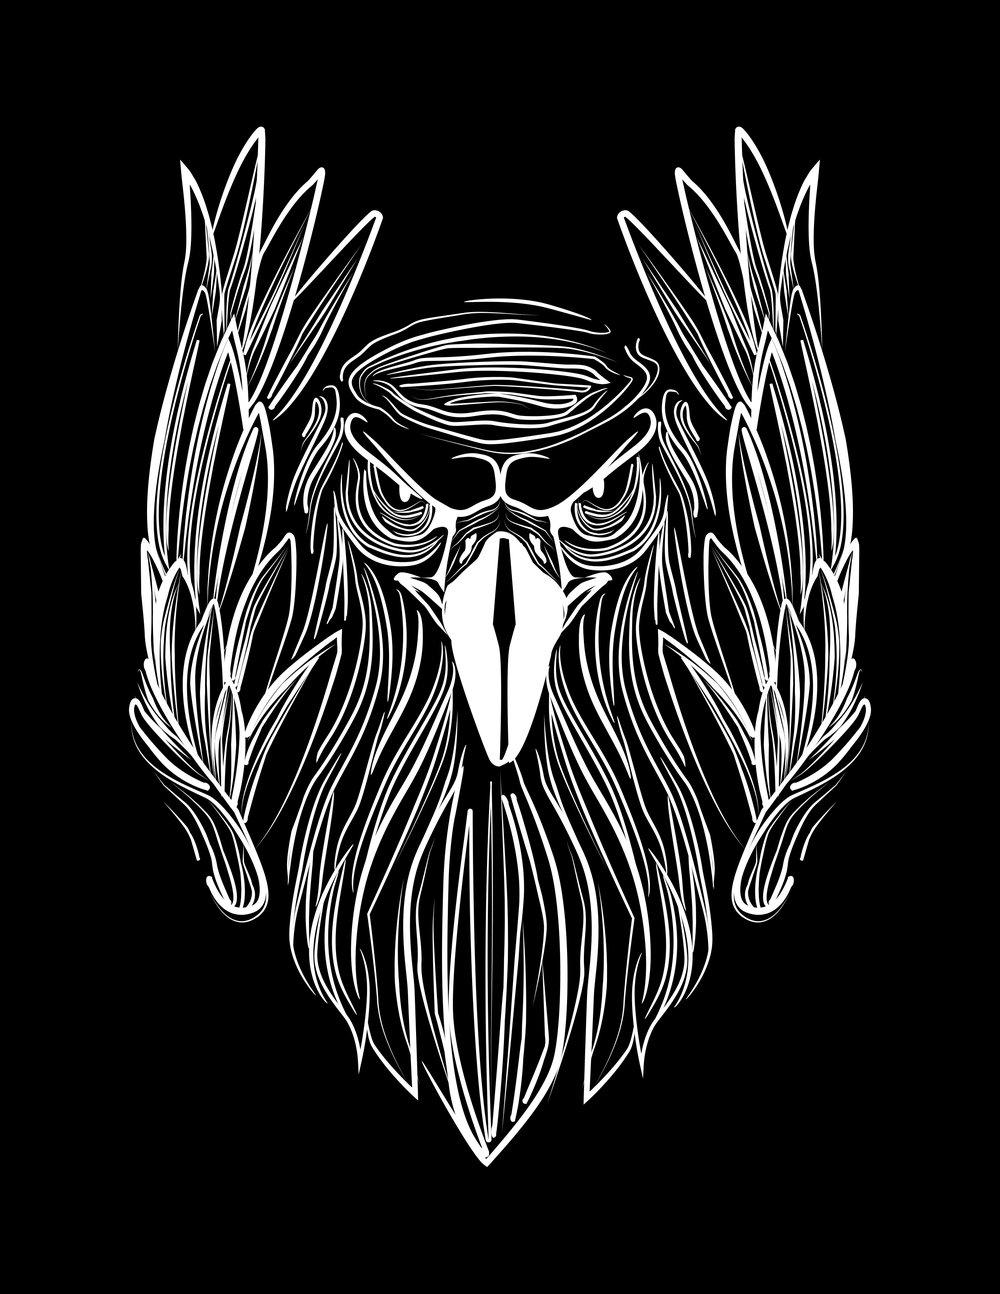 Eagle_cck1928Fiverr_2_WHITEonBLACK.jpg